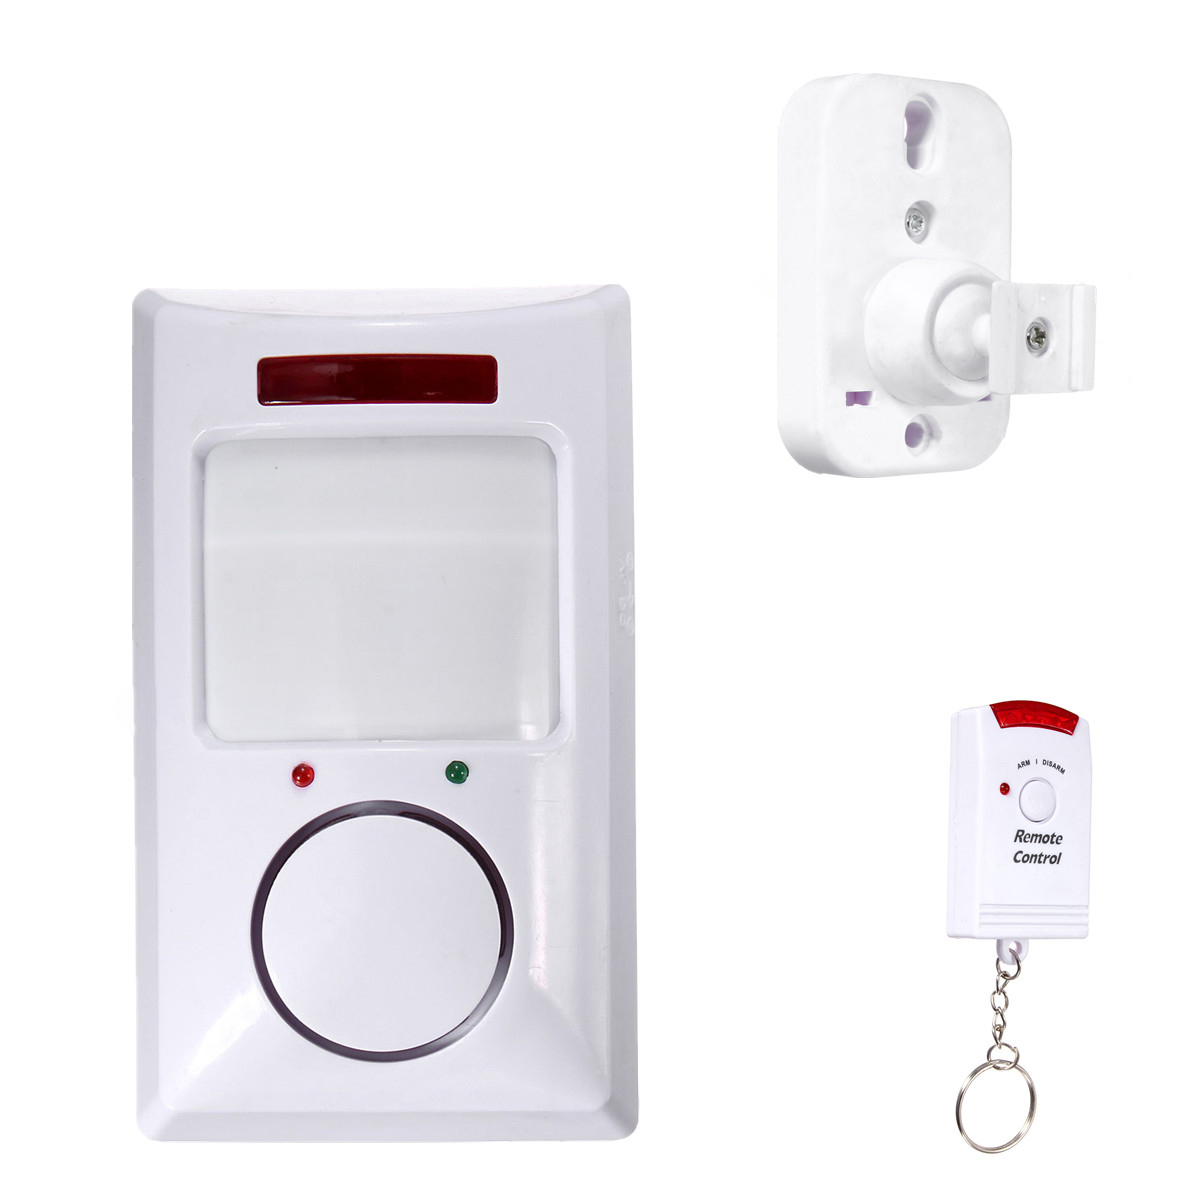 motion sensor alternator diagram wiring wireless ir detector 2 remote security